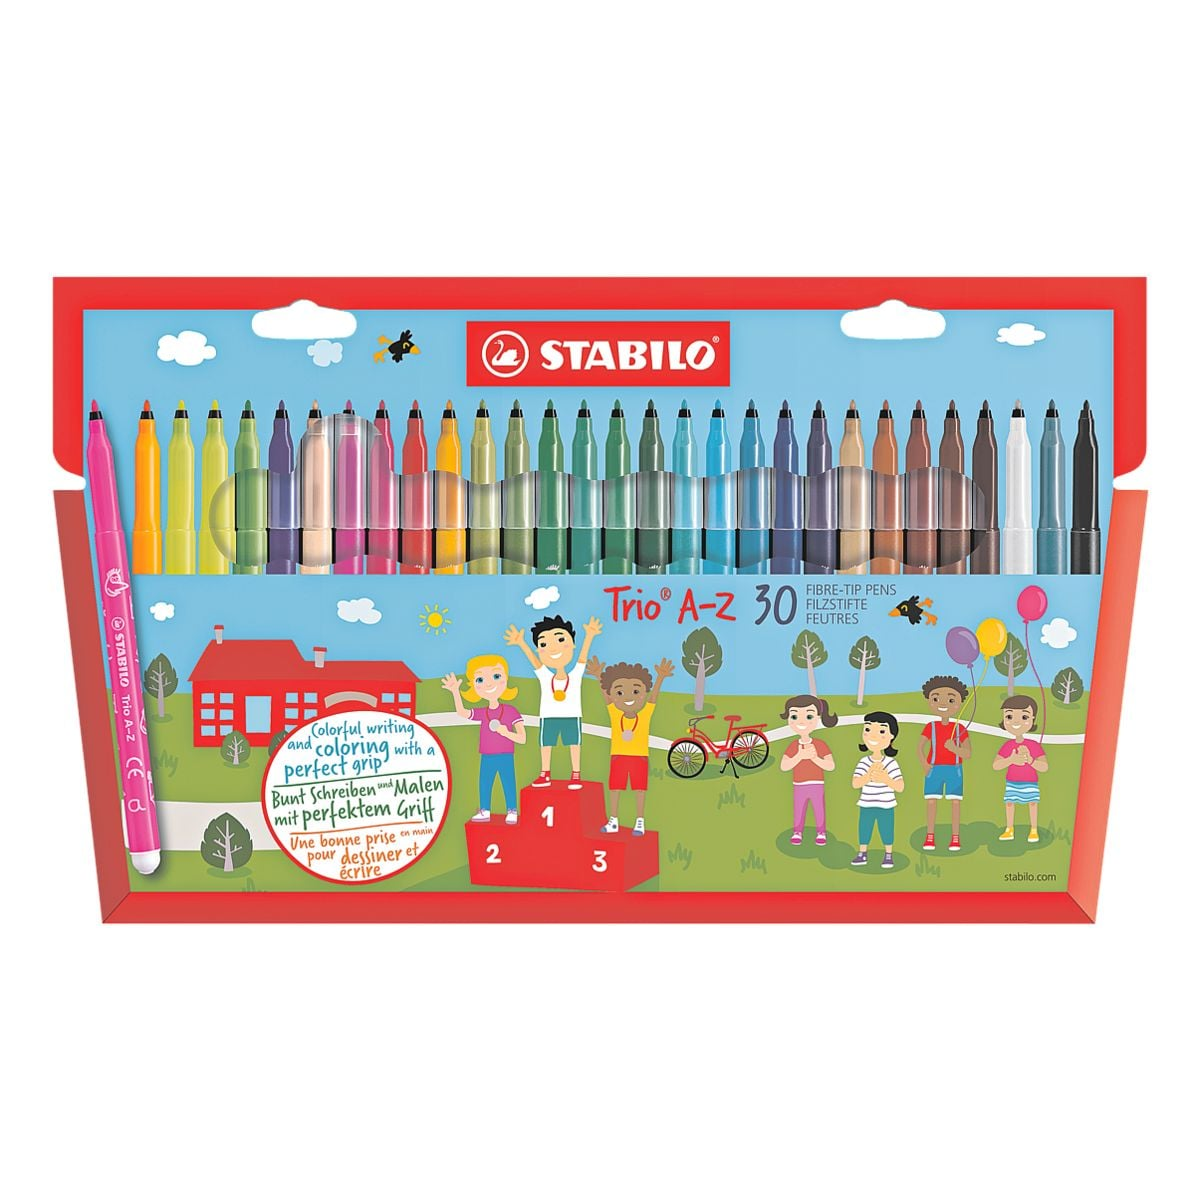 STABILO Paquet de 30 stylos feutres « Trio® A-Z »